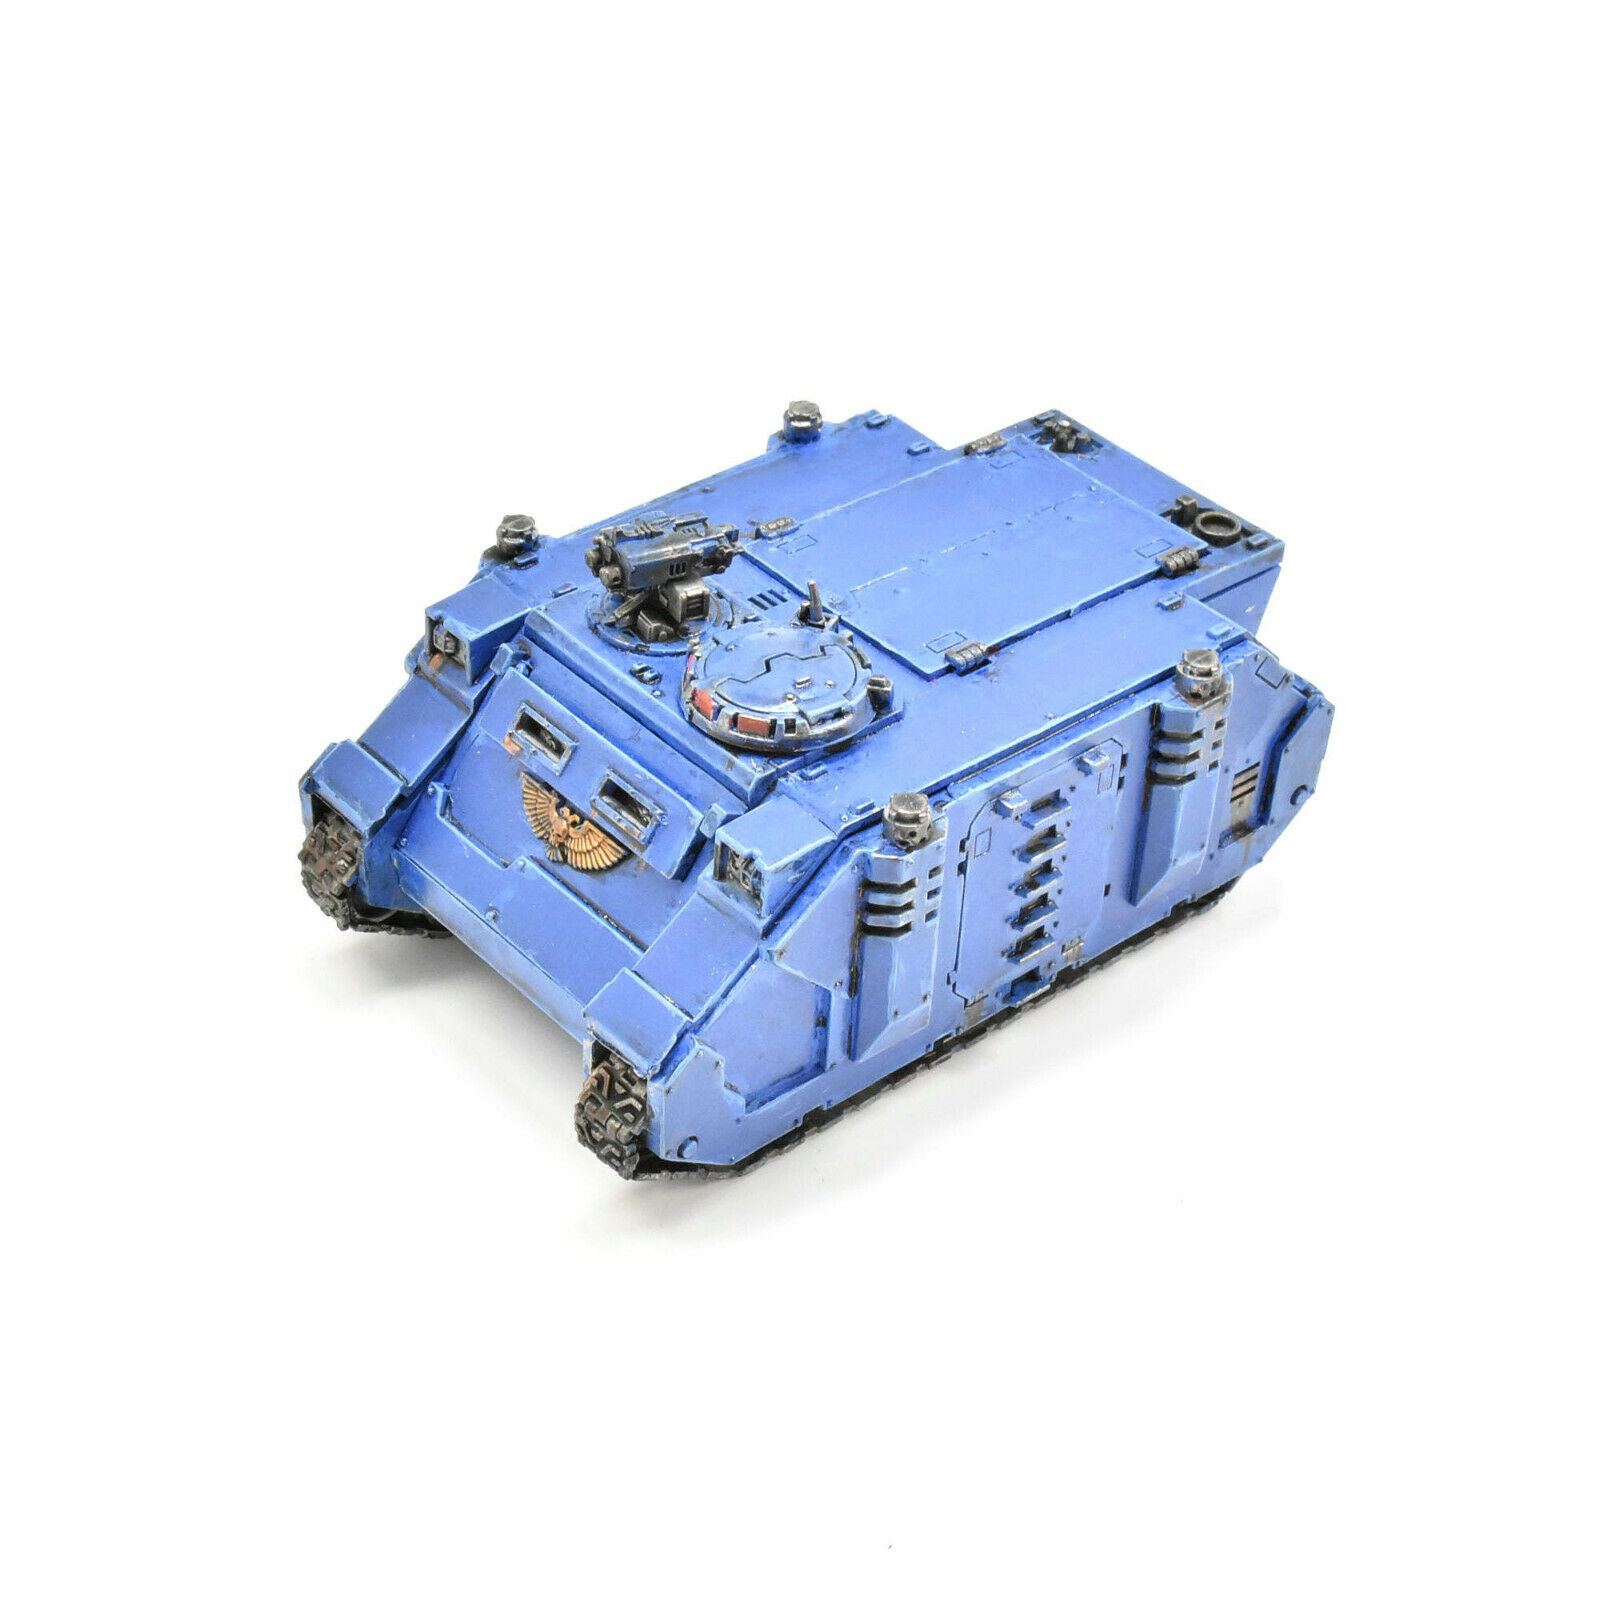 SPACE MARINES Rhino tank PAINTED Warhammer 40K ultramarines